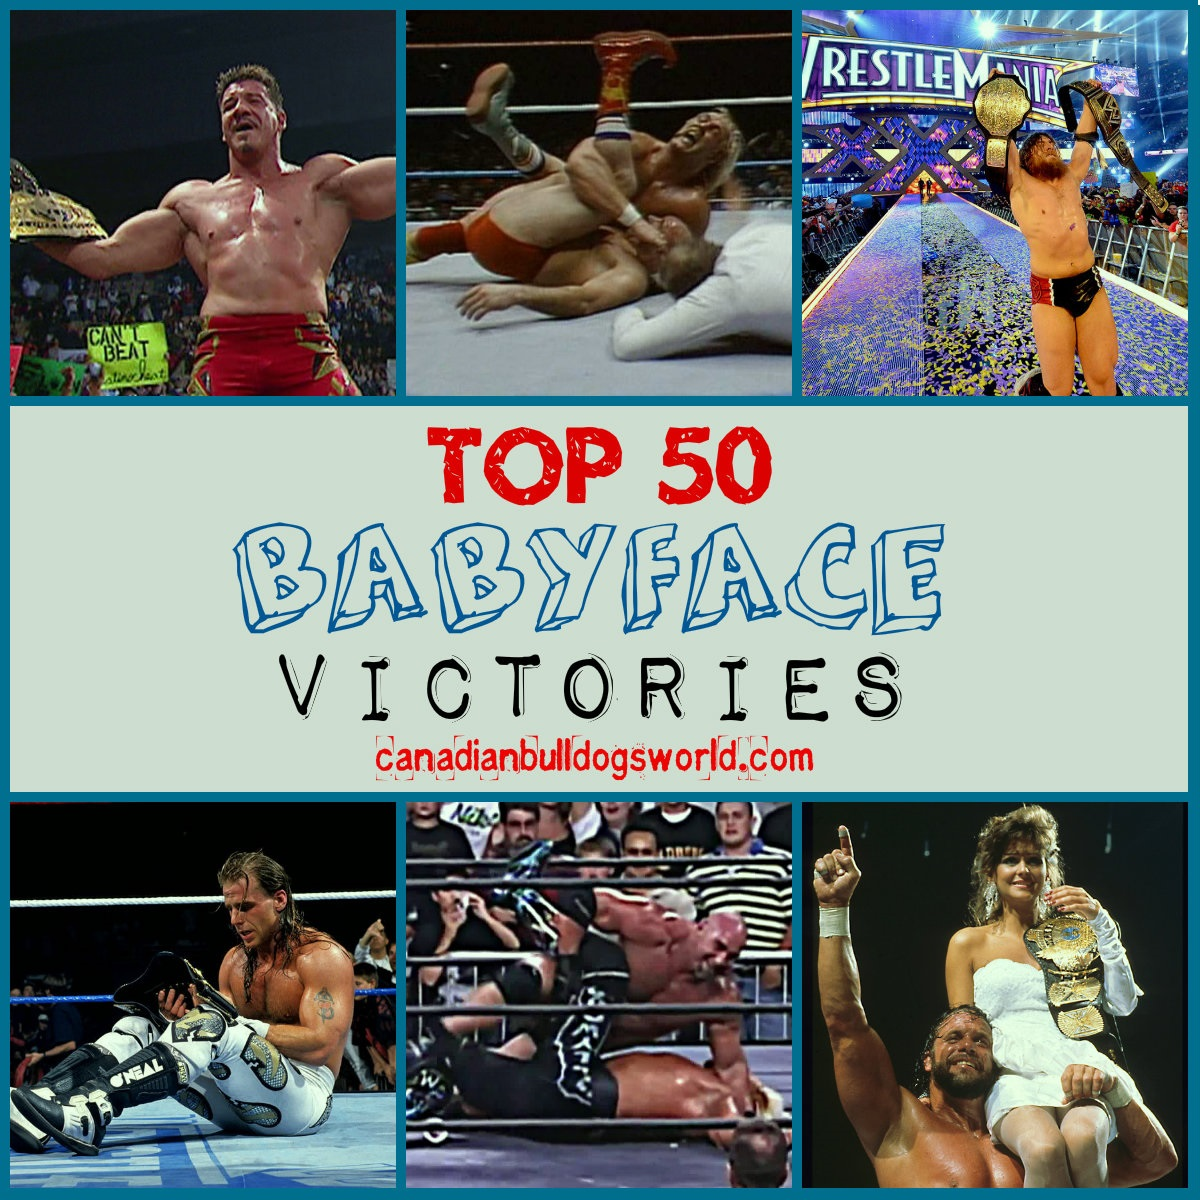 Top 50 Babyface Victories